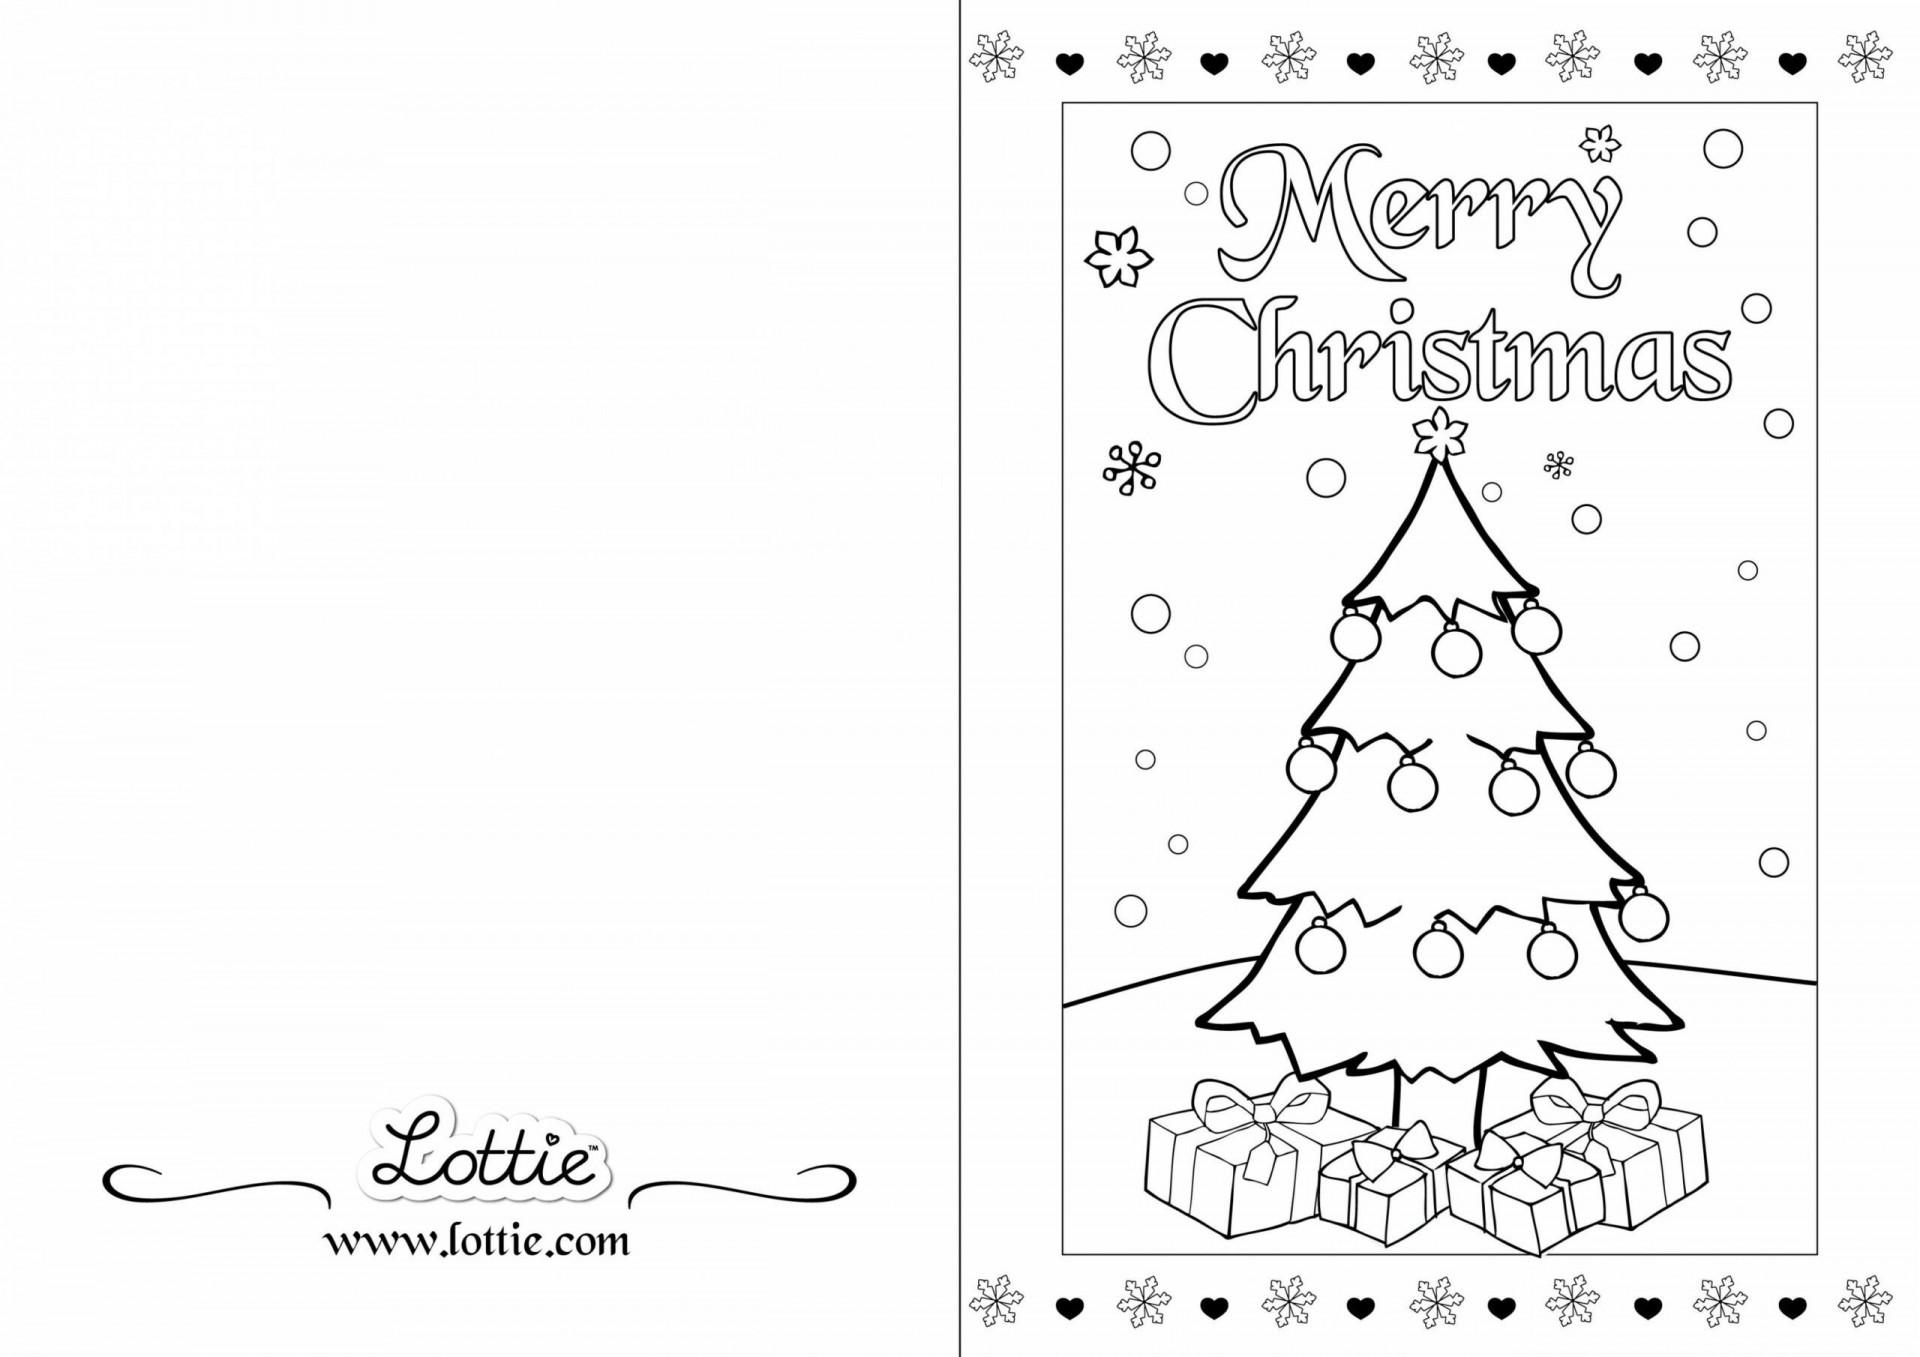 003 Unique Free Printable Religiou Christma Card Template Inspiration  Templates1920